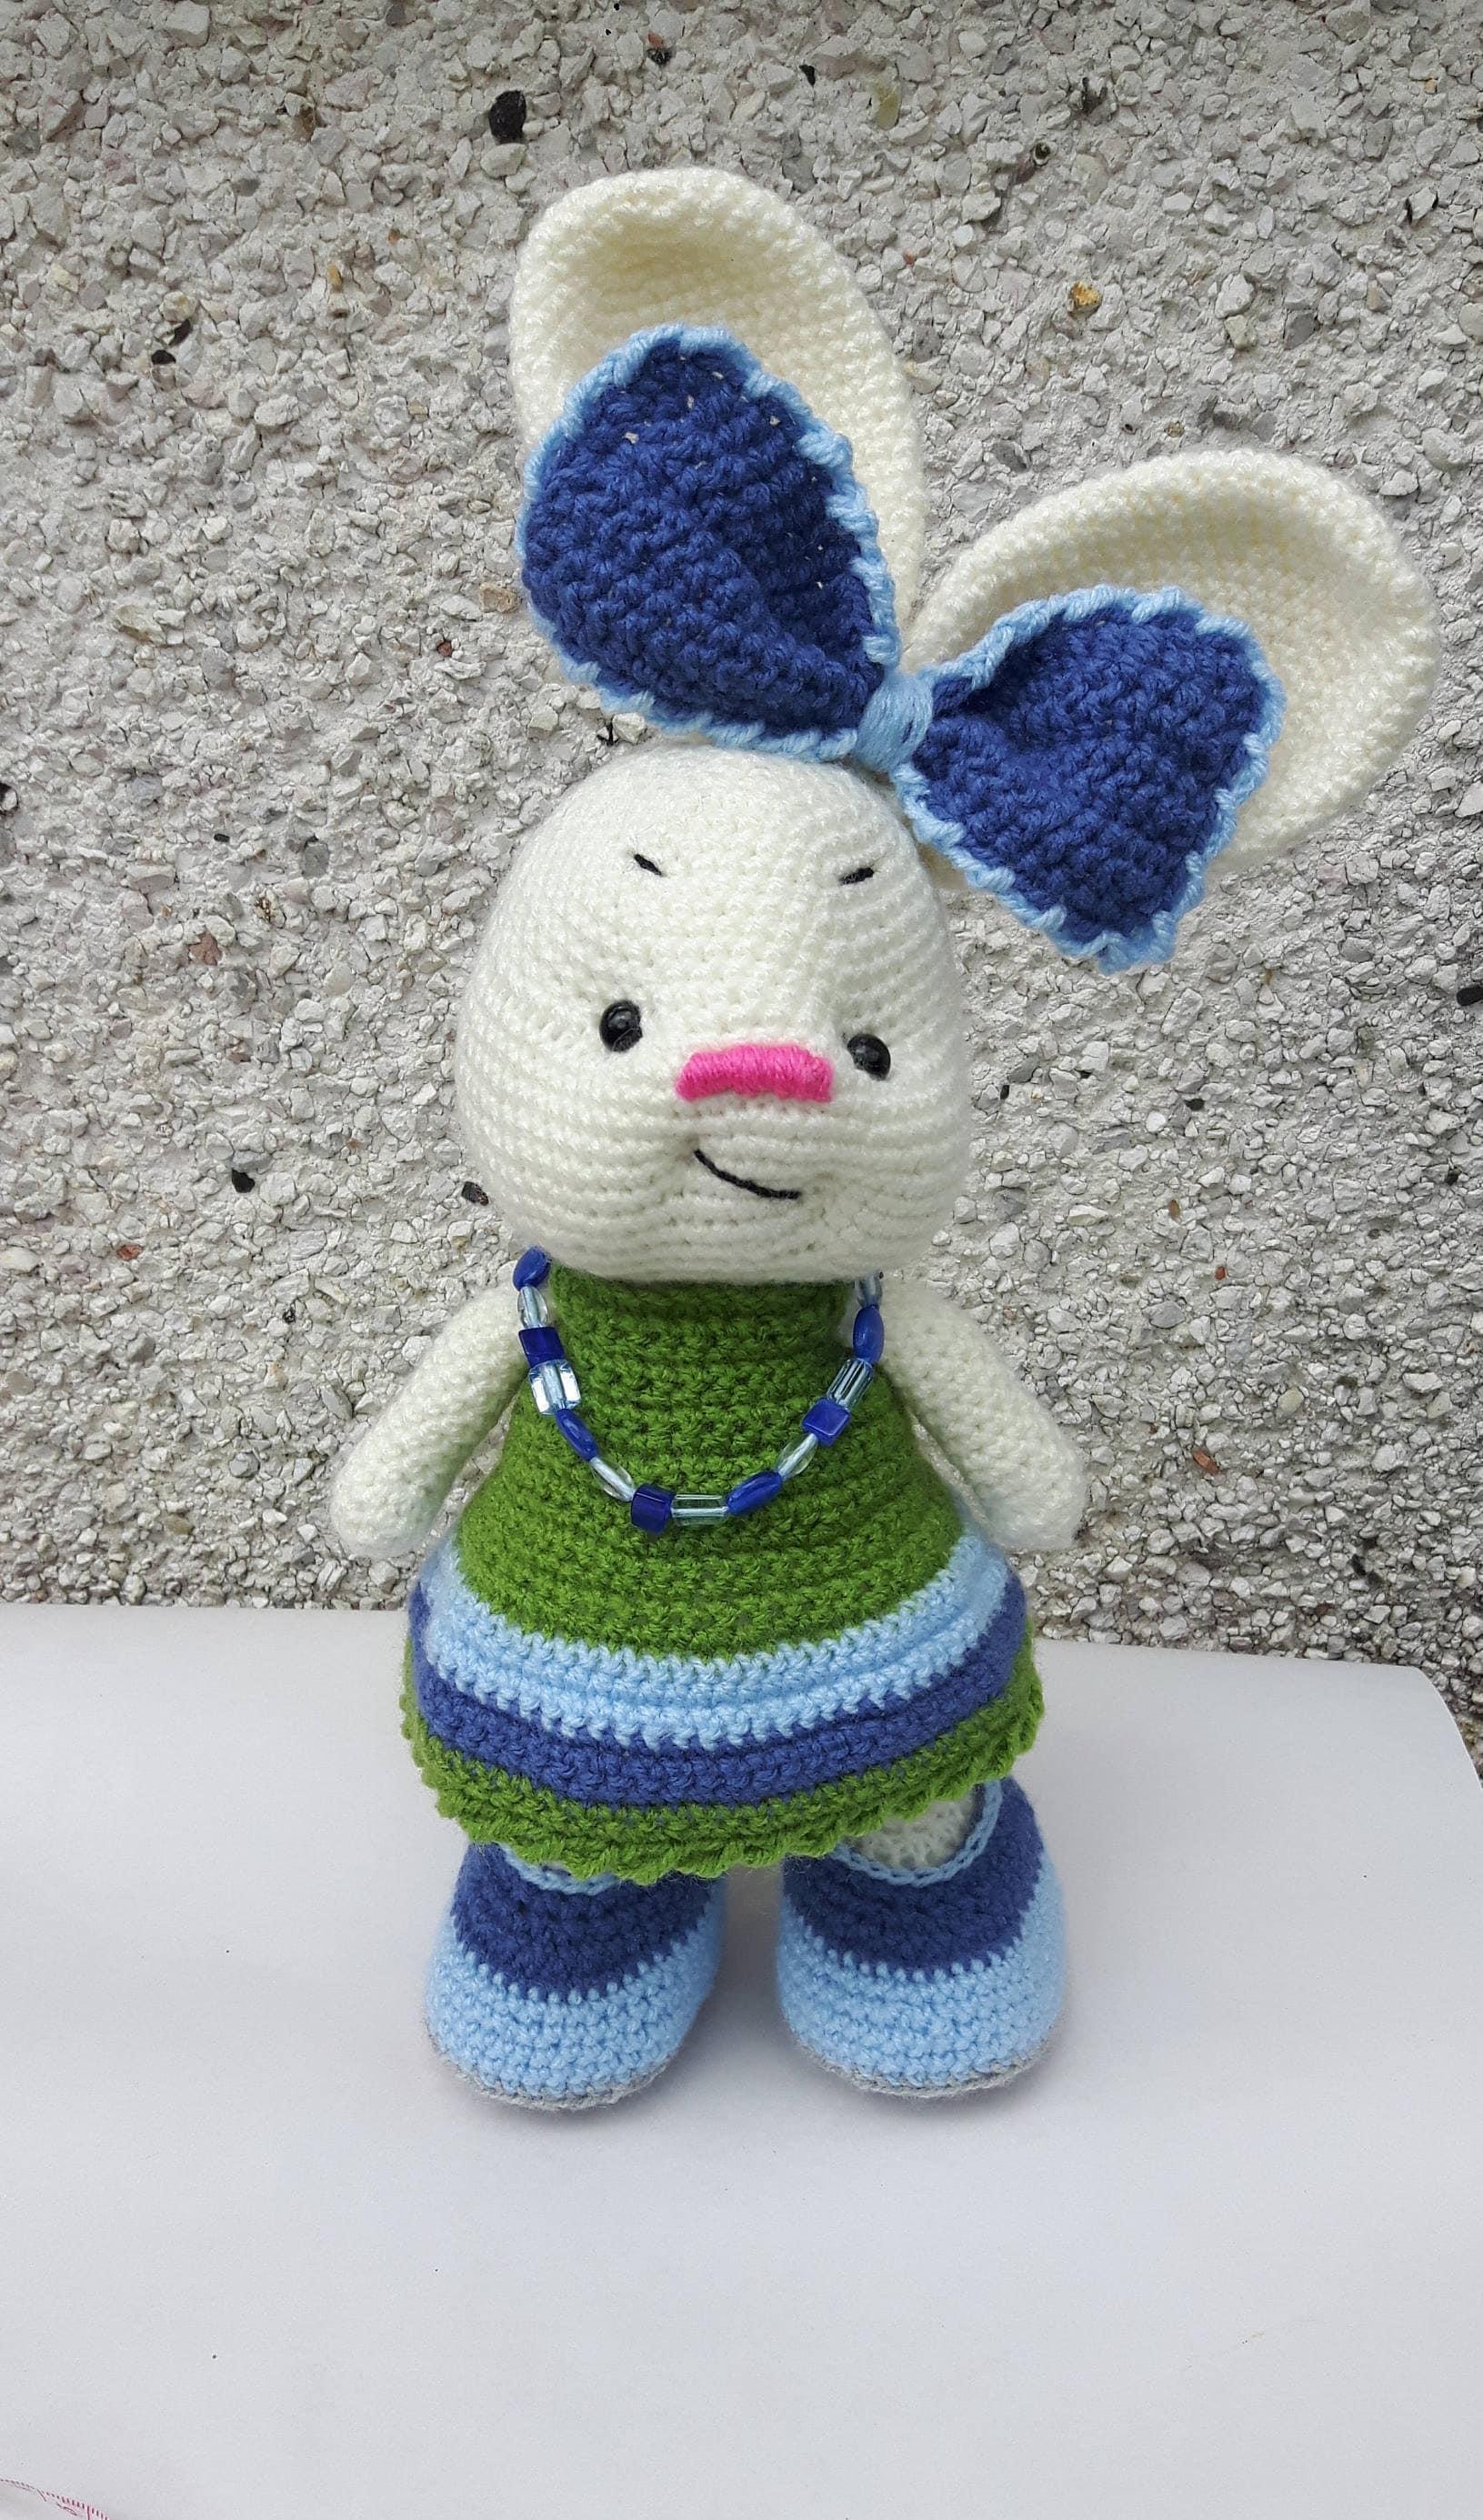 Amigurumi Bunny Crotchet Bunny Happy Bunny Soft Toy Stuffed Animal Amigurumi Toy Toy for Kids Handmade Toy Plush and Cuddly